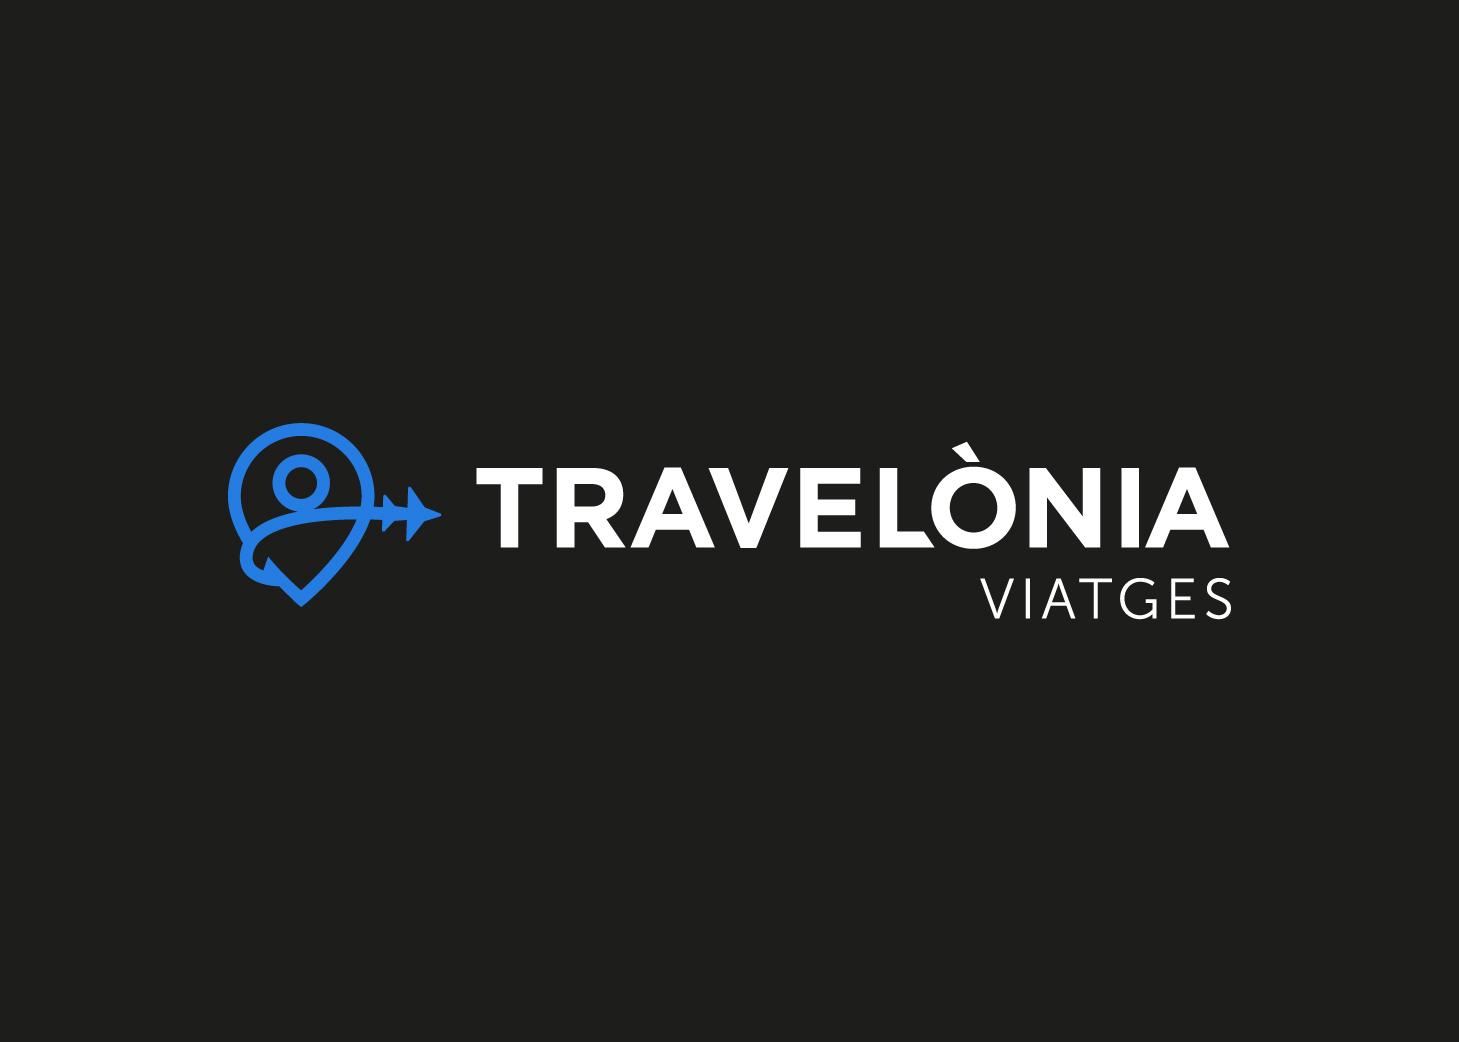 logotipo-viajes-travelonia